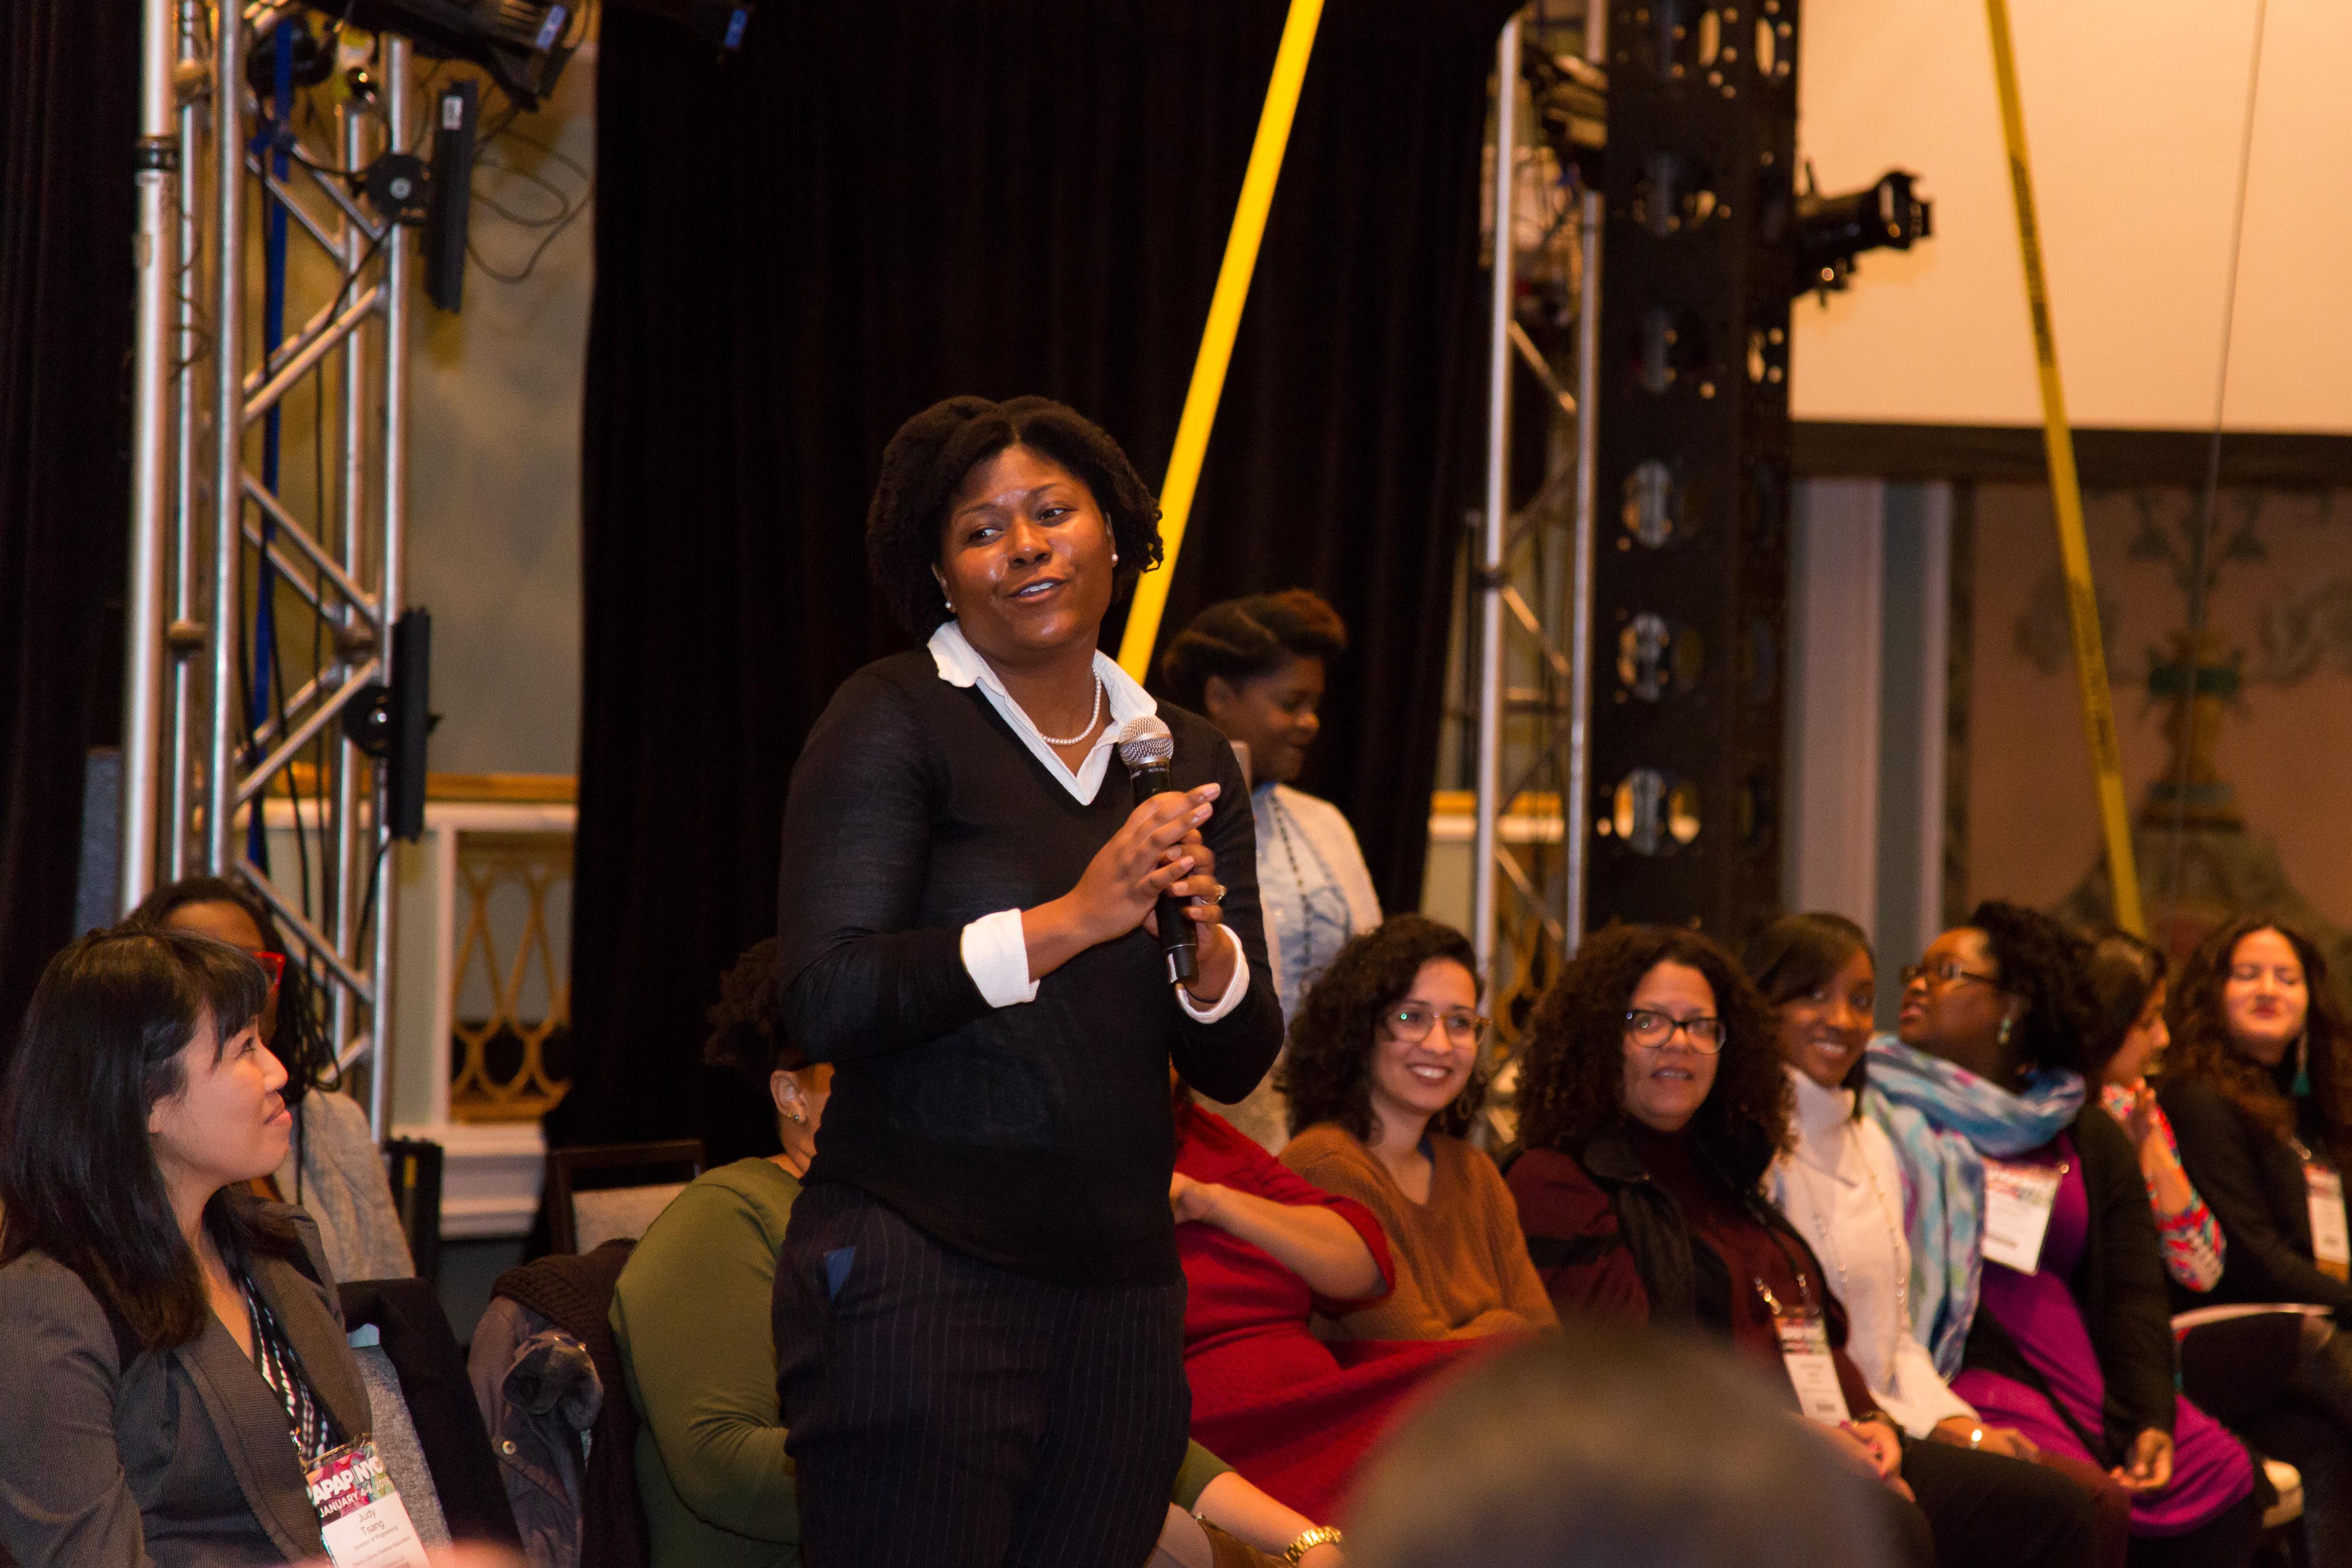 To help them succeed, minority women need tailored development programs